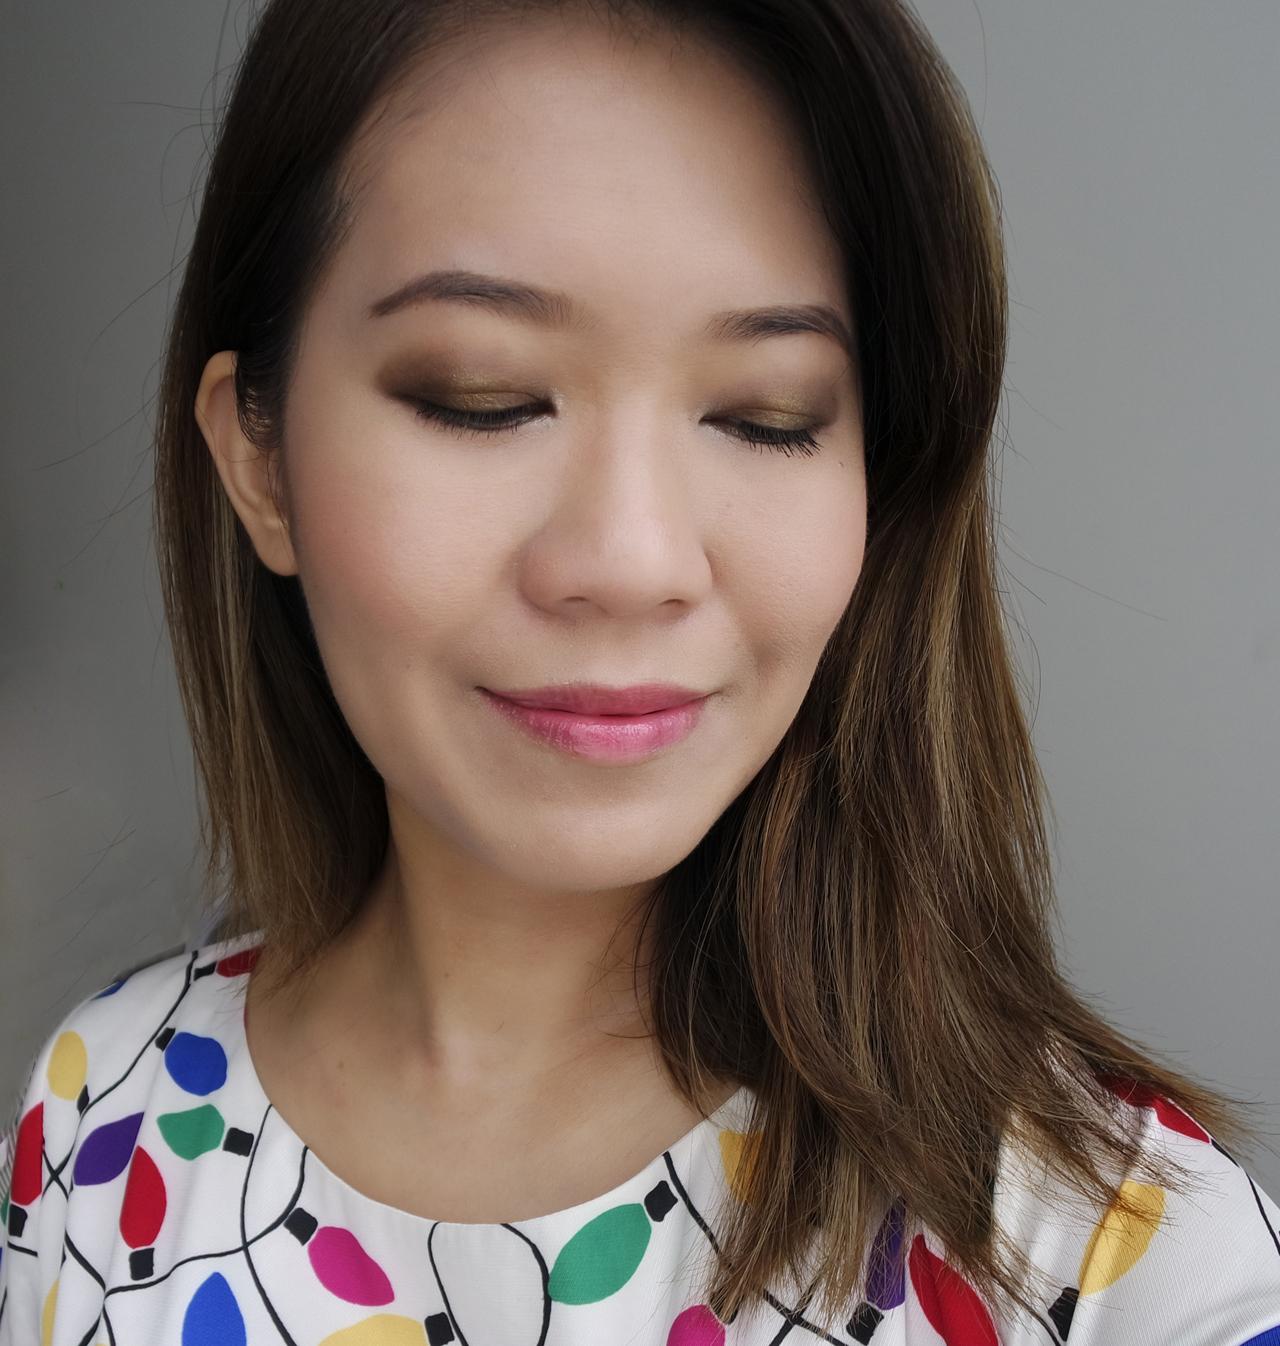 Chanel Les 4 Ombres Code Elegants full makeup look